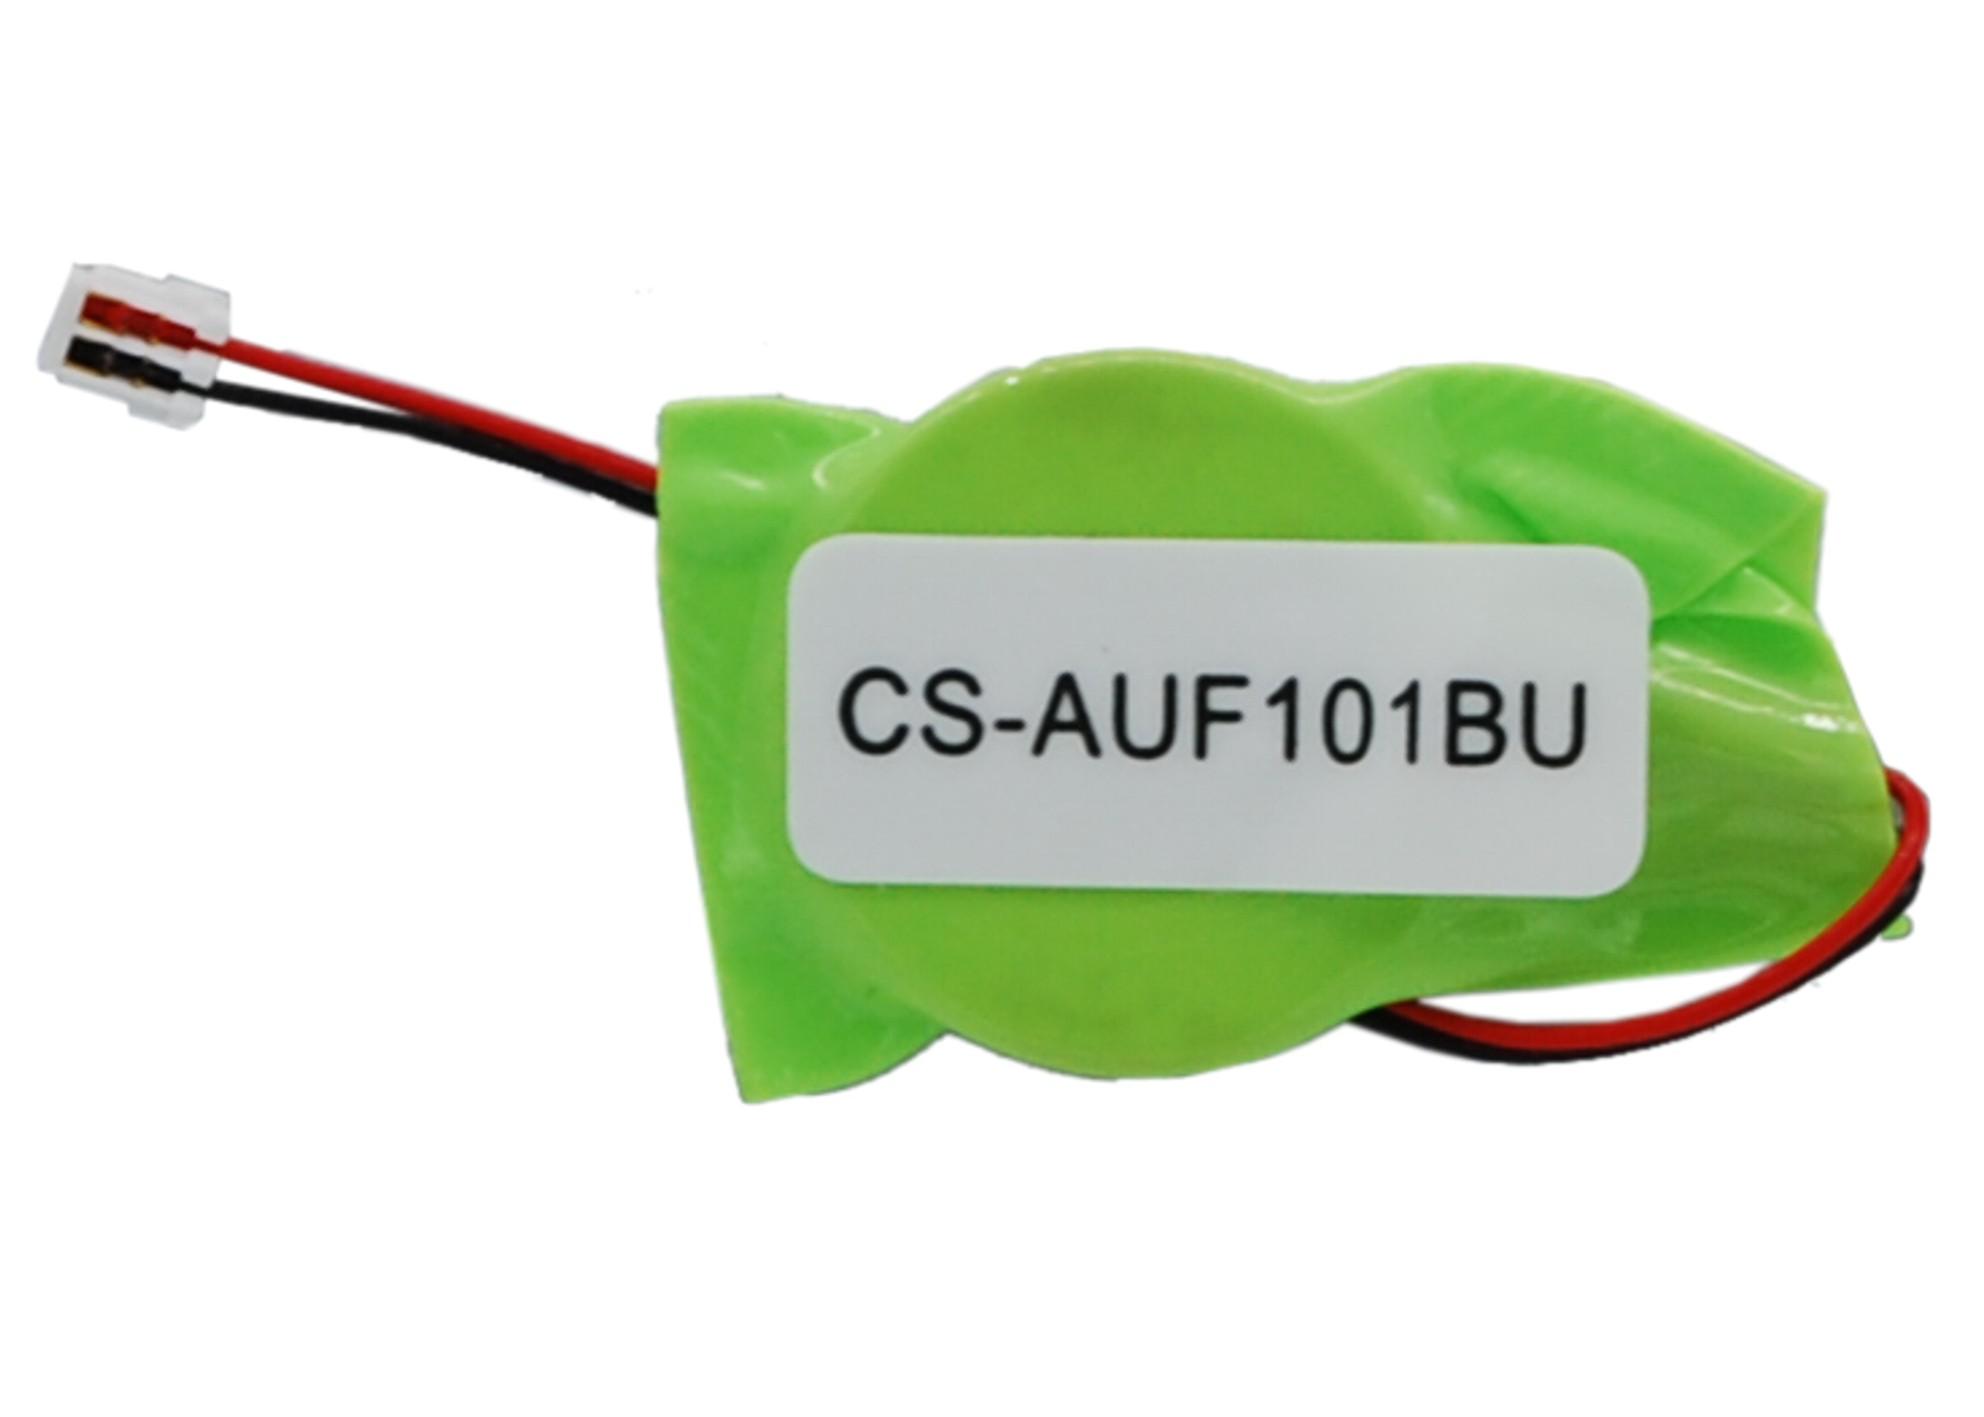 Cameron Sino baterie cmos pro ASUS Eee Pad Transformer TF101-1B185A 3V Li-ion 40mAh zelená - neoriginální